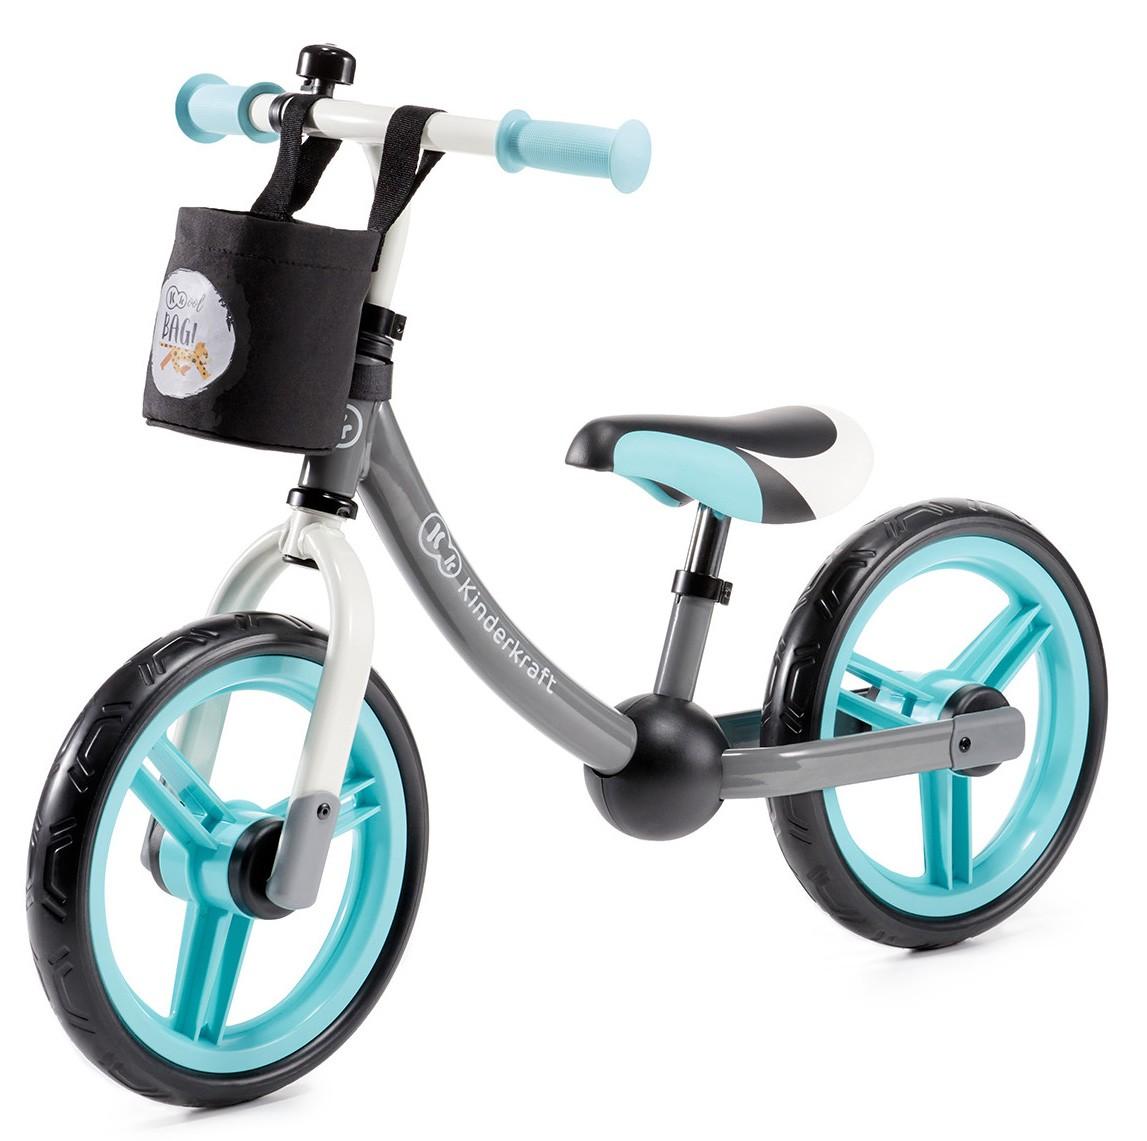 Bici 2Way Next Kinderkraft Gray/Turquoise